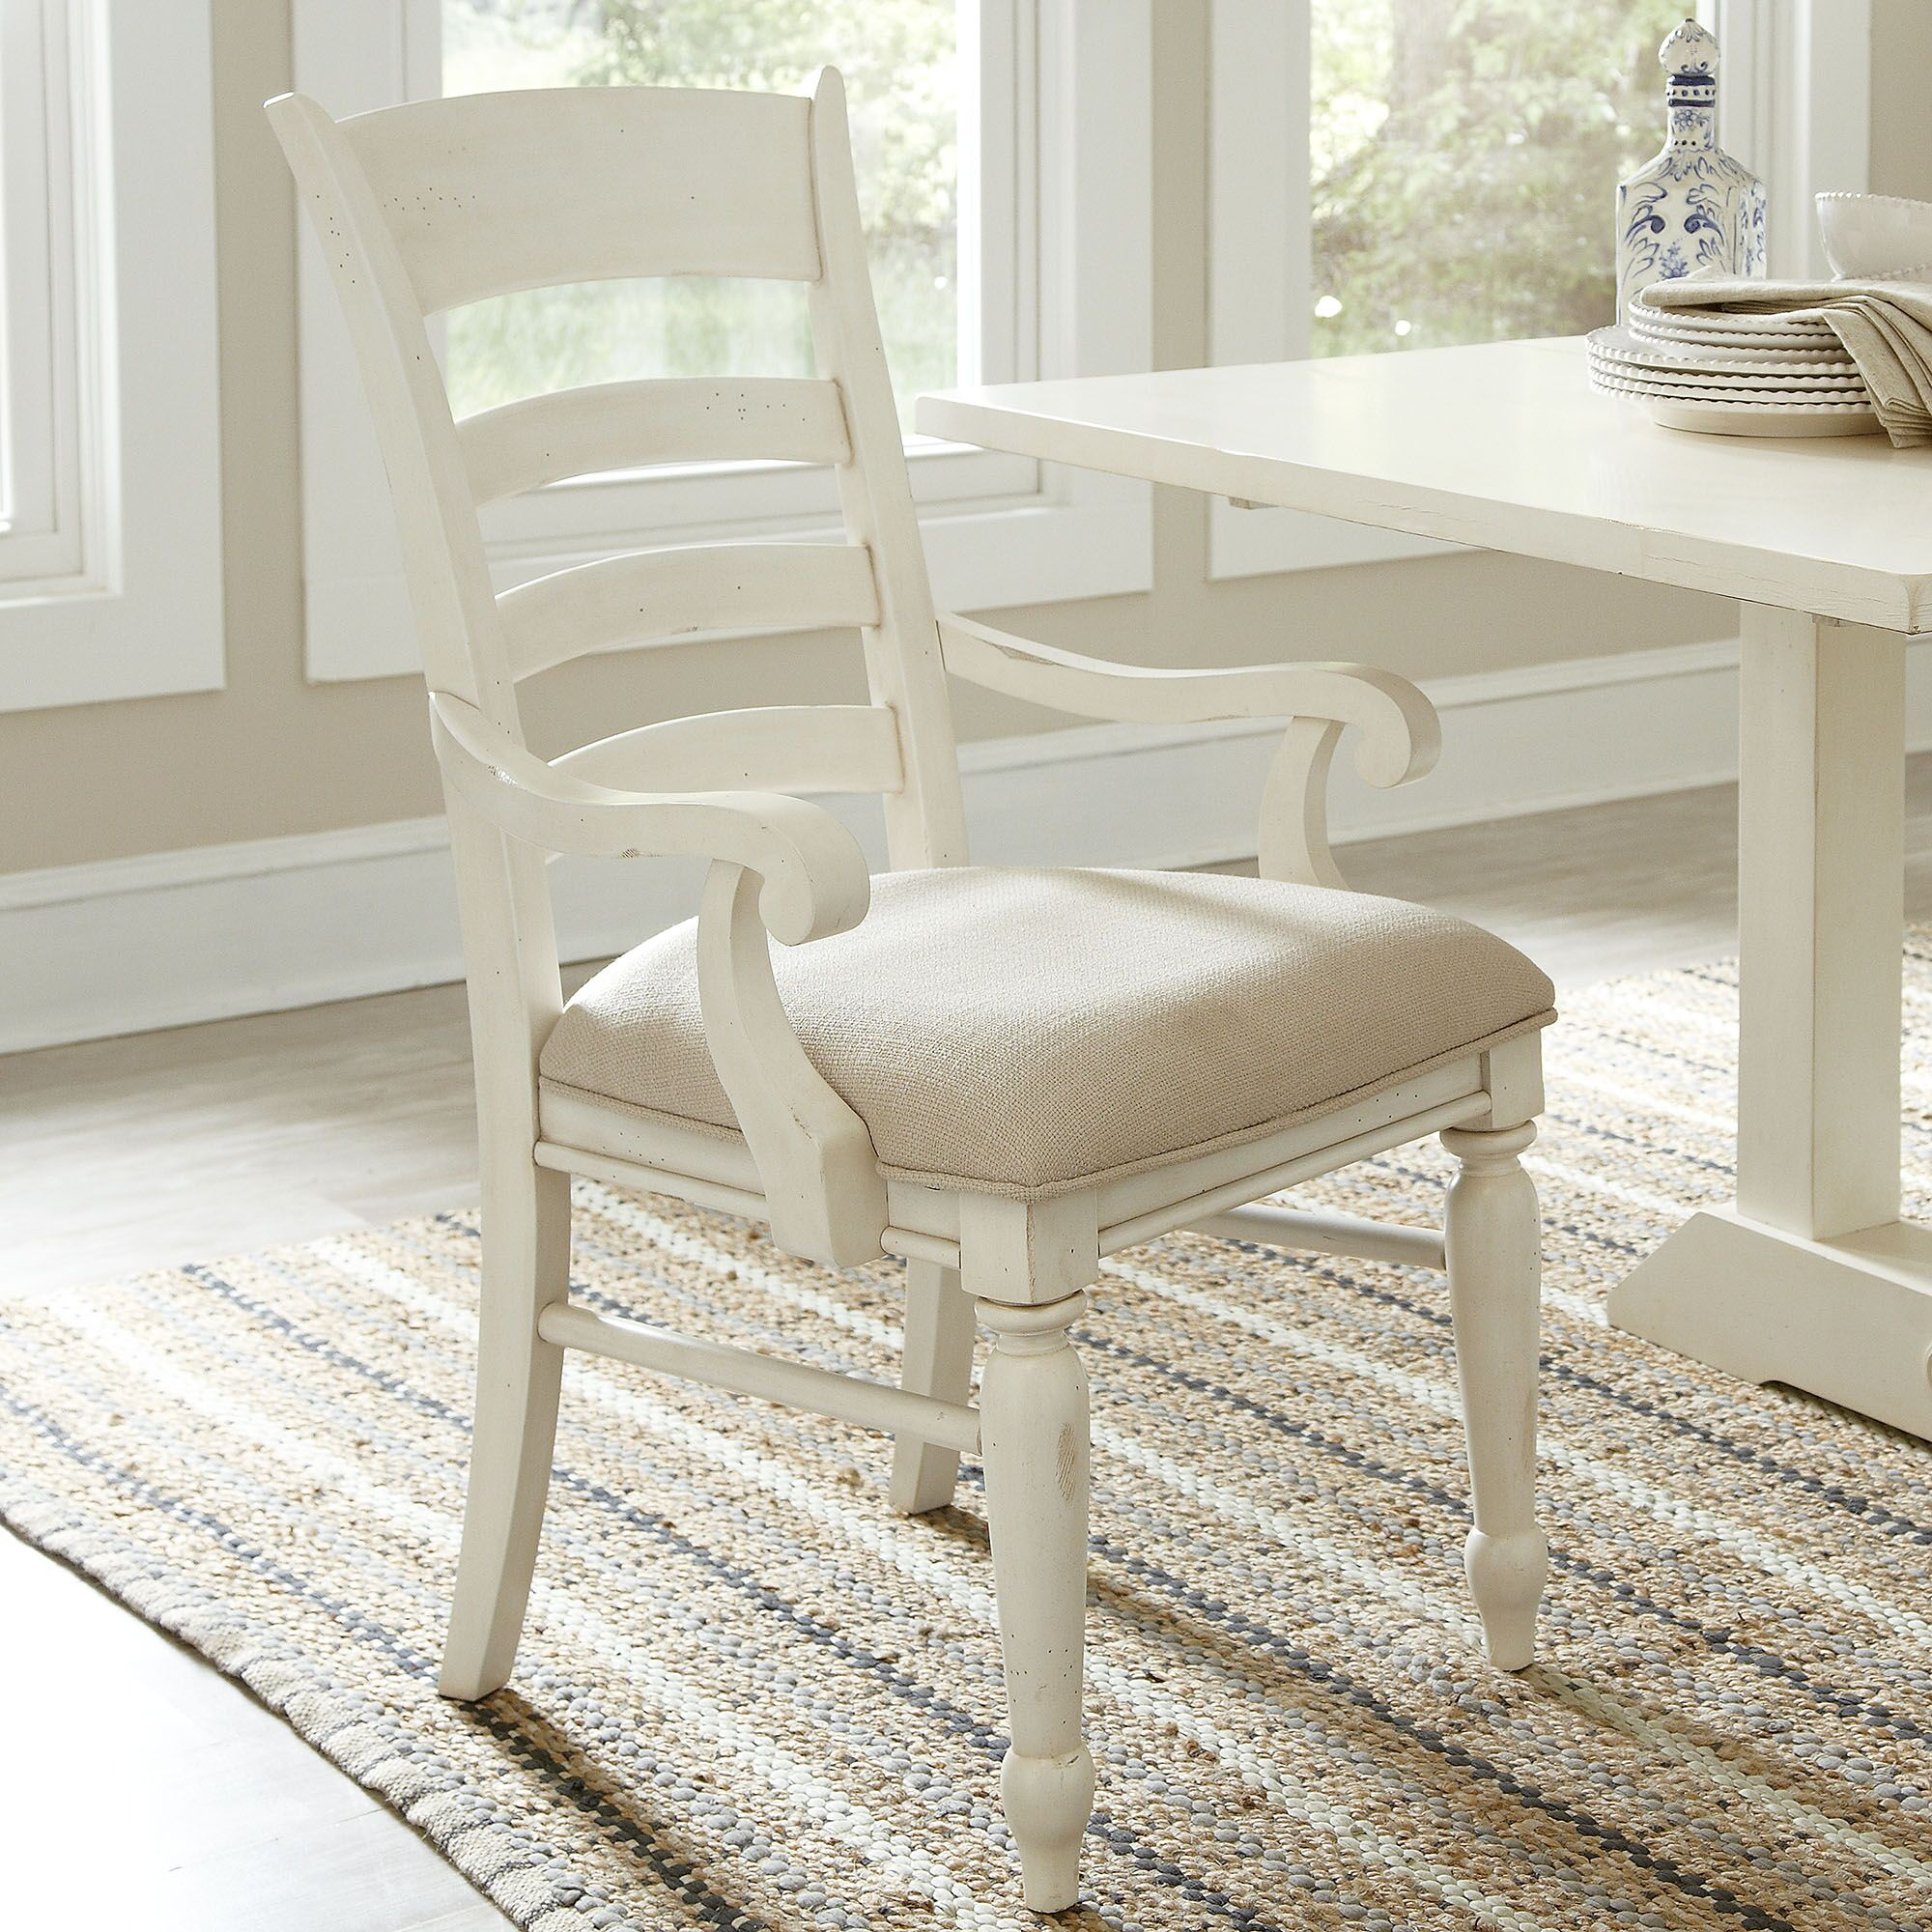 Lisbon Ladder-Back Arm Chairs (Set of 2) Finish: Cream/White